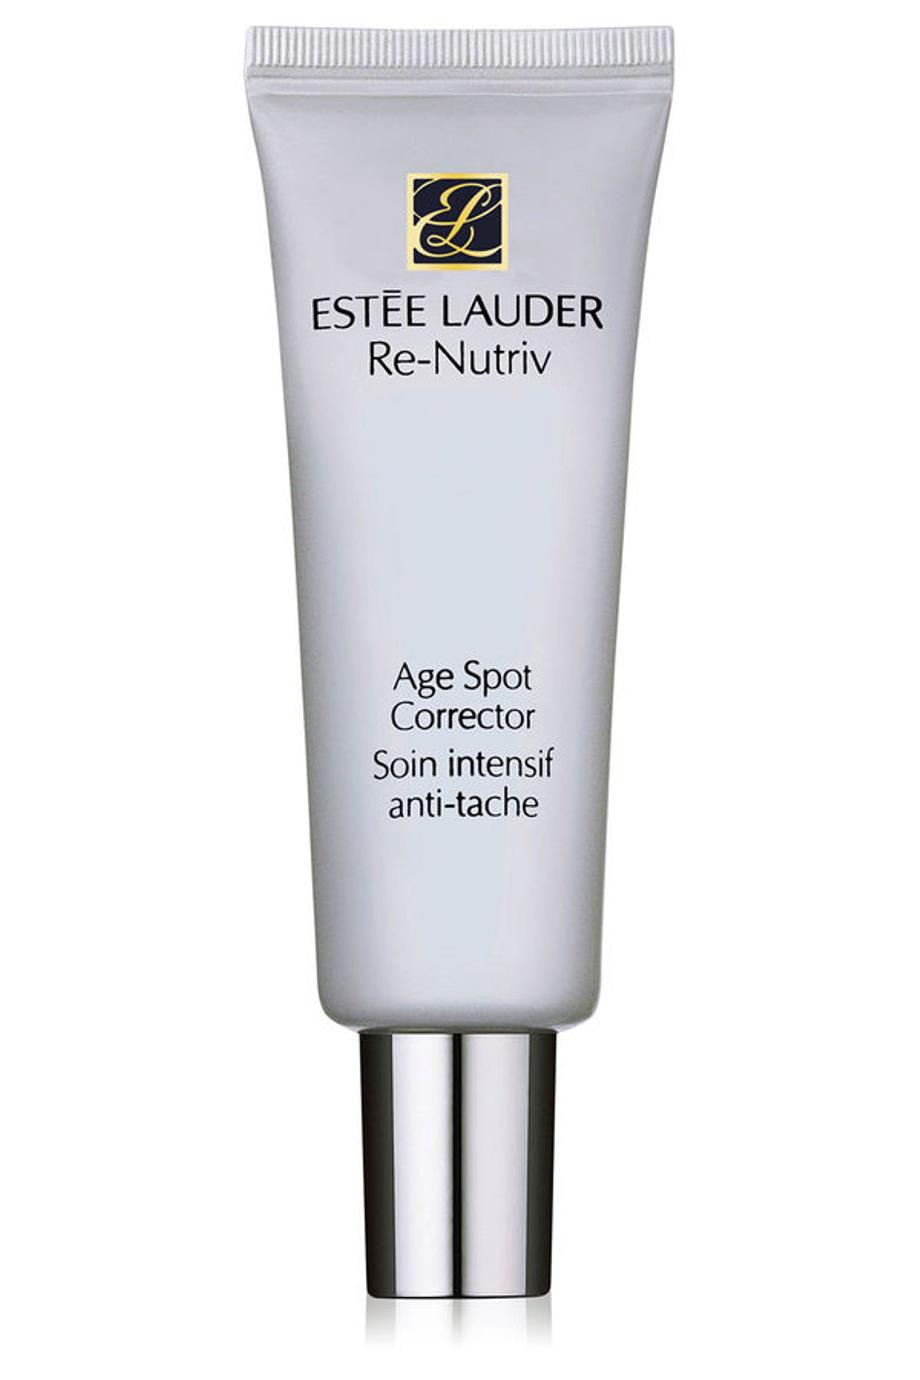 Estee Lauder - Re-Nutriv Intensive Age Spot Corrector -30ml/1oz Homme Force Supreme Total Reactivator Anti Aging Gel Care 1.69oz